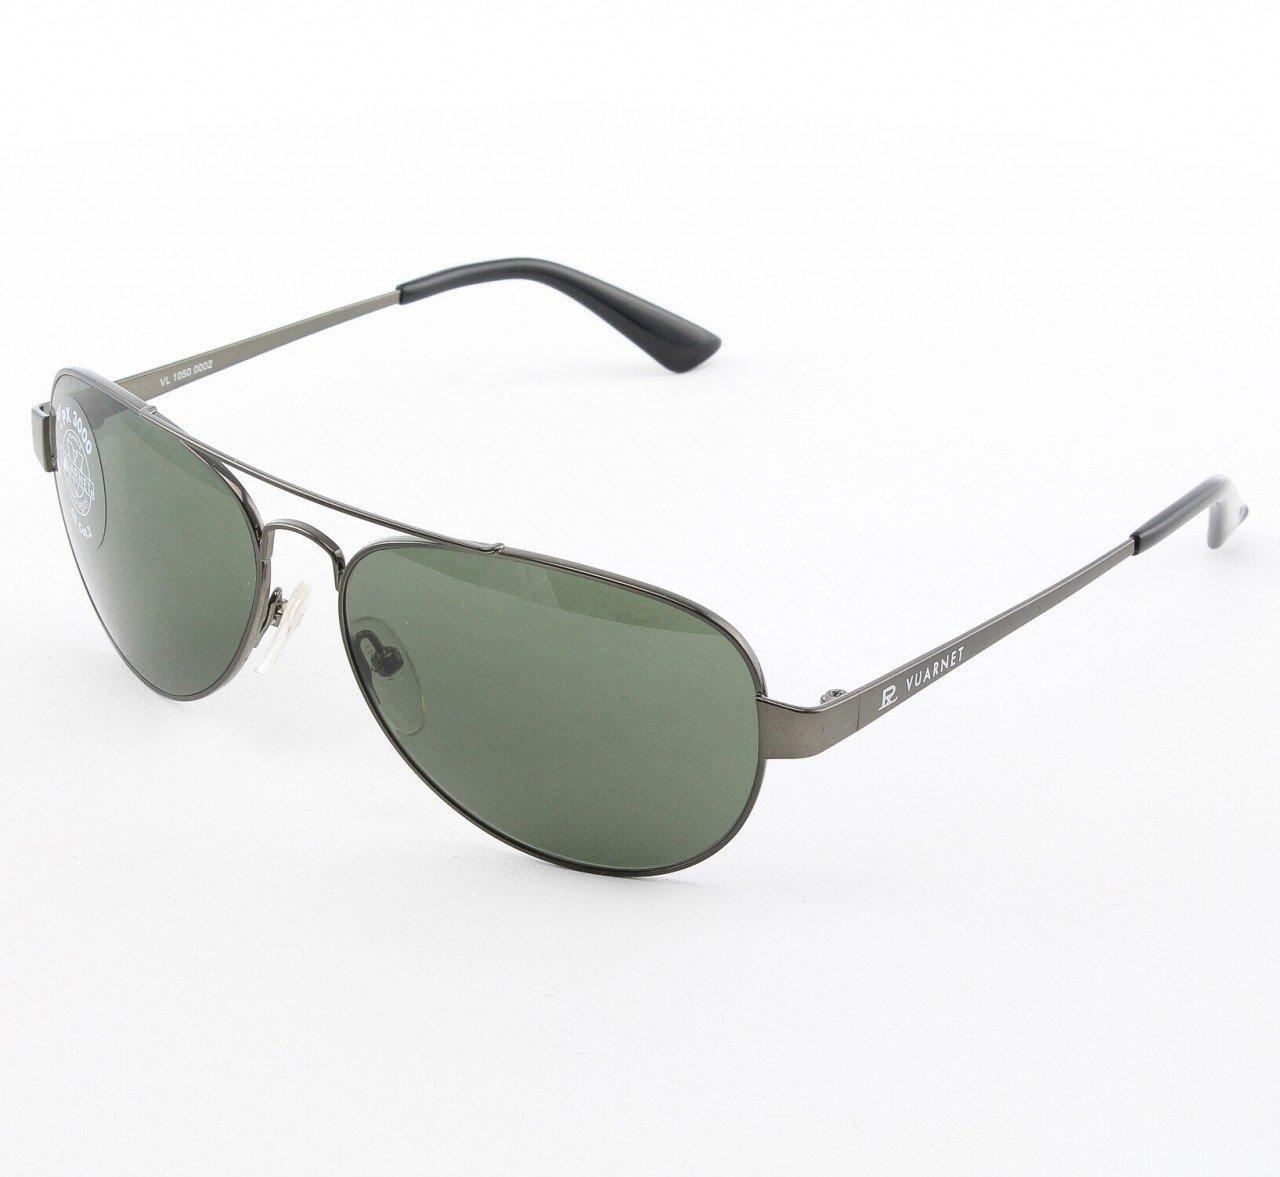 Vuarnet VL 1050 Uni Aviator Sunglasses Col. 0002 1121 Silver with Green Grey PX3000 Lenses